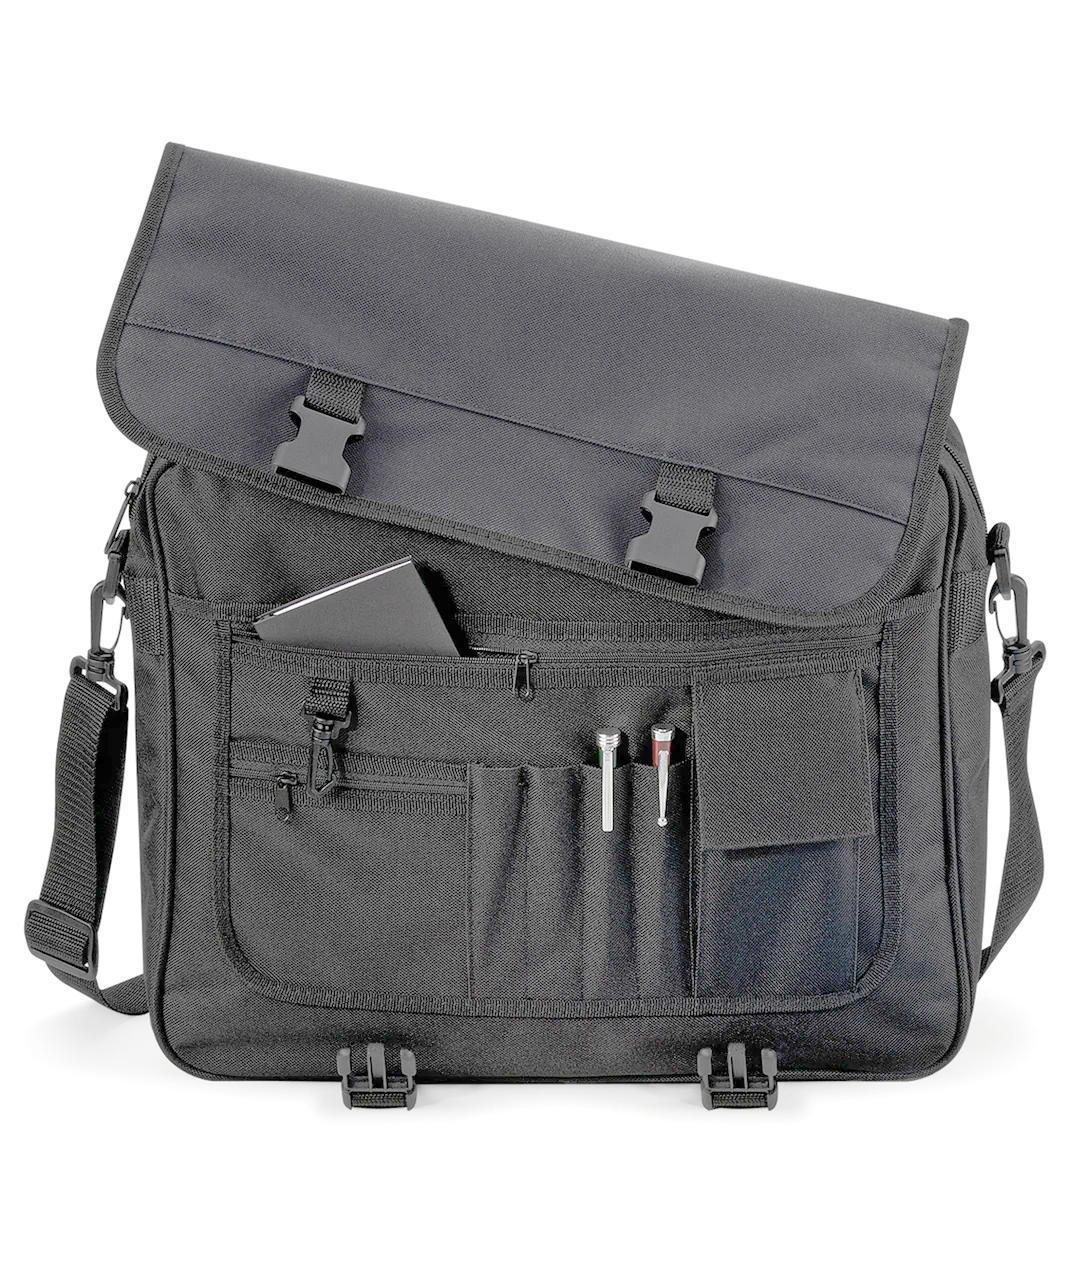 Don Barrow Navigators and Co-Drivers Kit Bag - Black -Inside 2